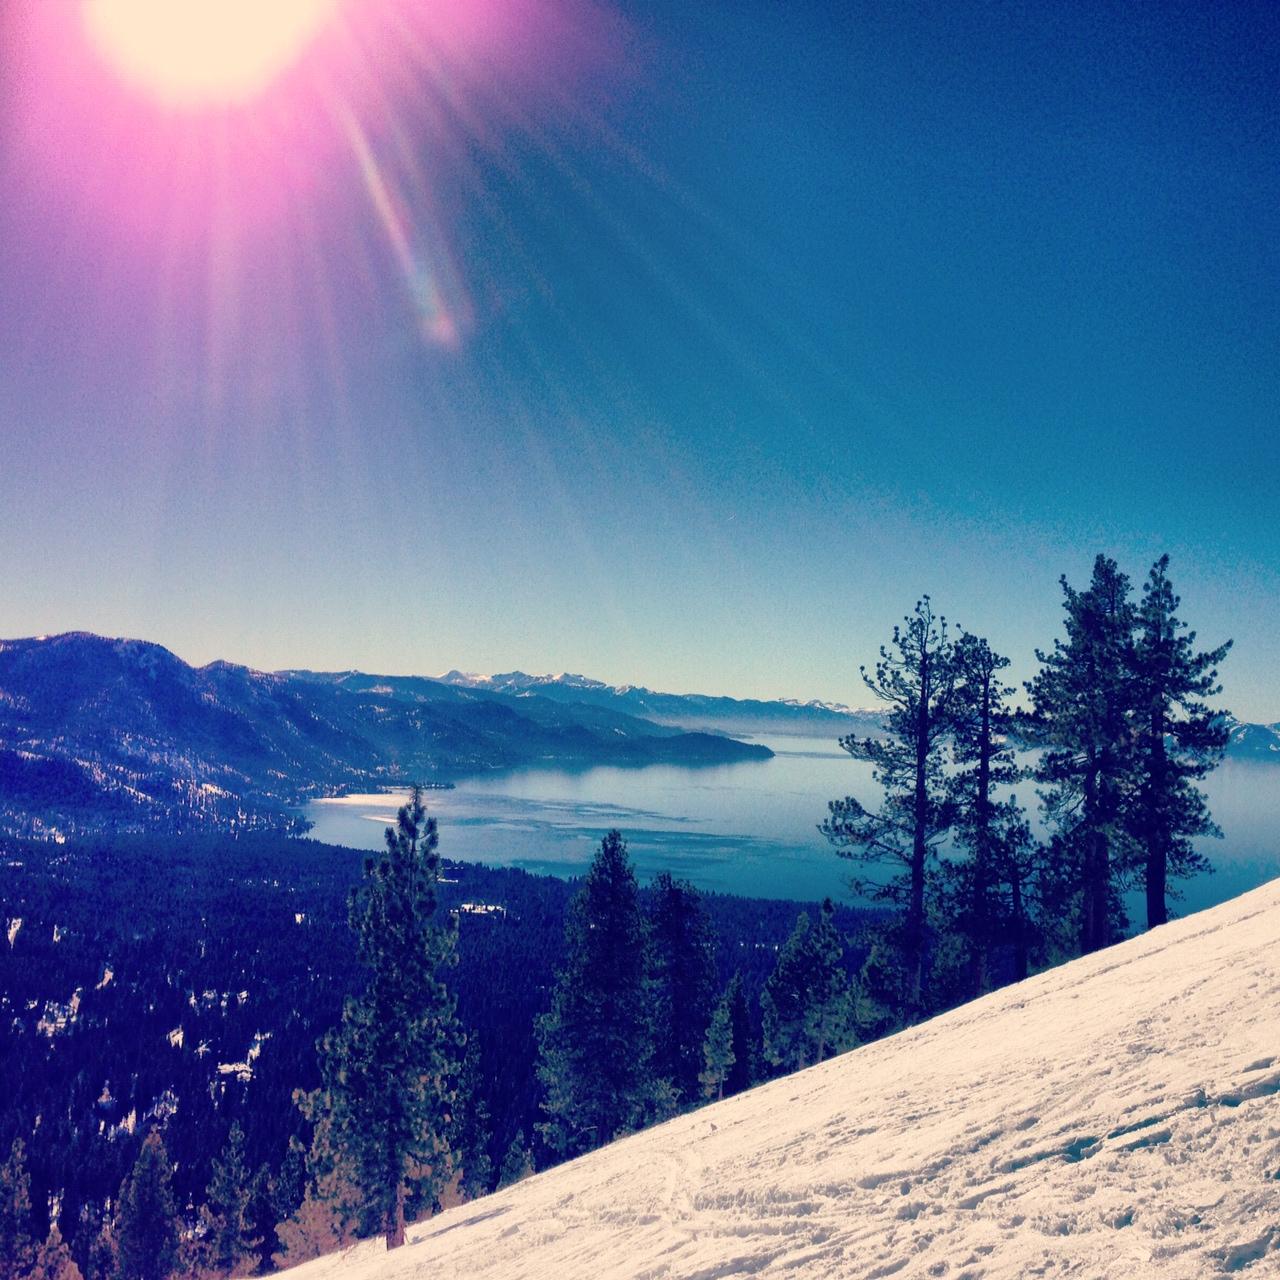 My first backcountry ski trip!